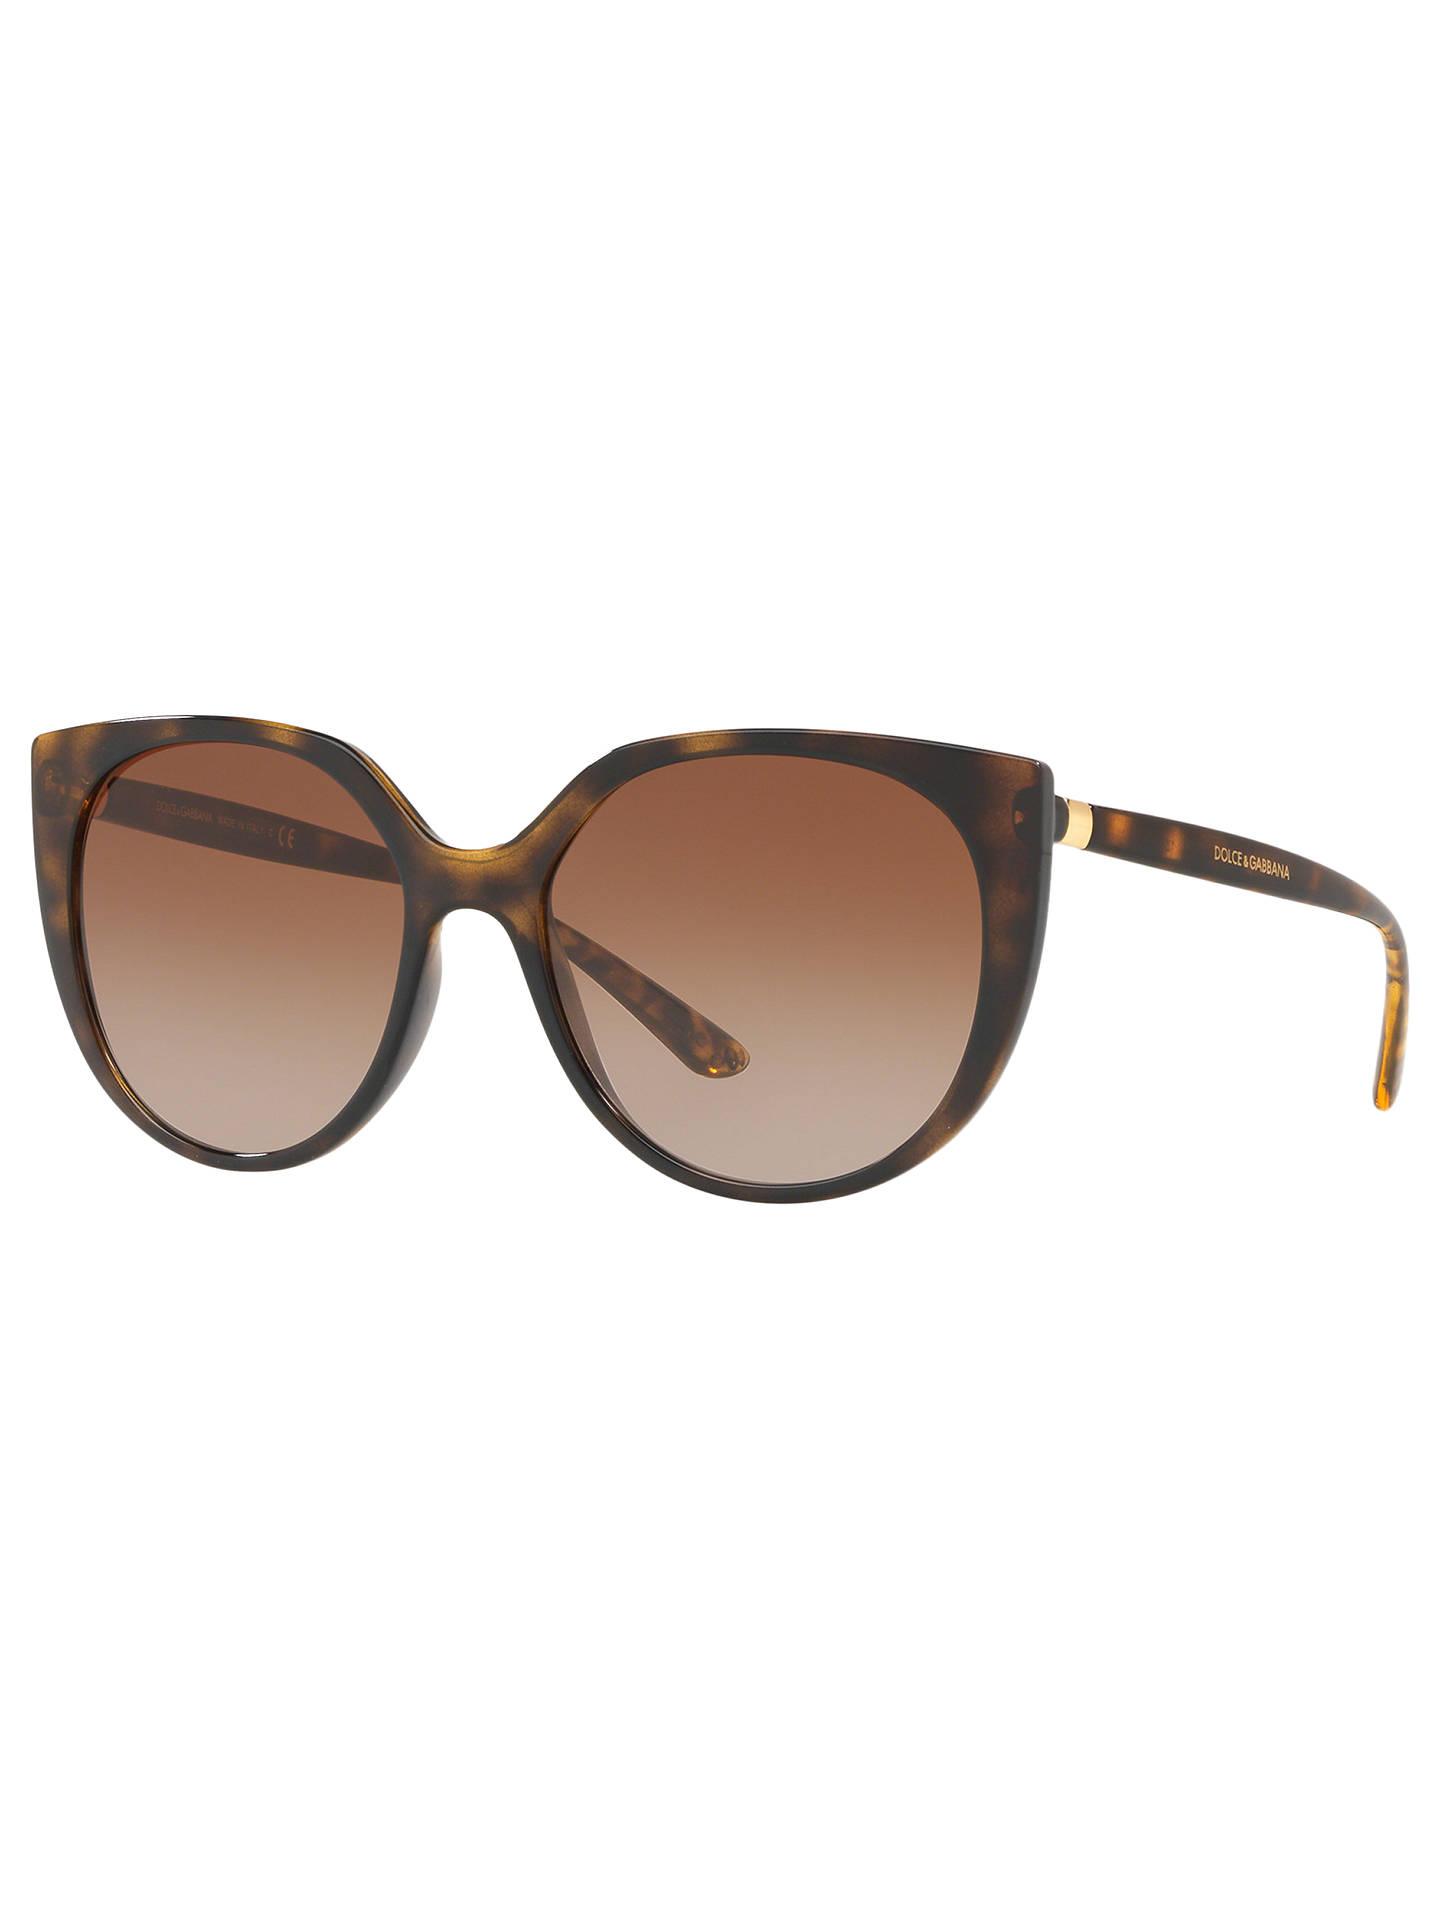 ae41562f87 Buy Dolce   Gabbana DG6119 Women s Oval Sunglasses